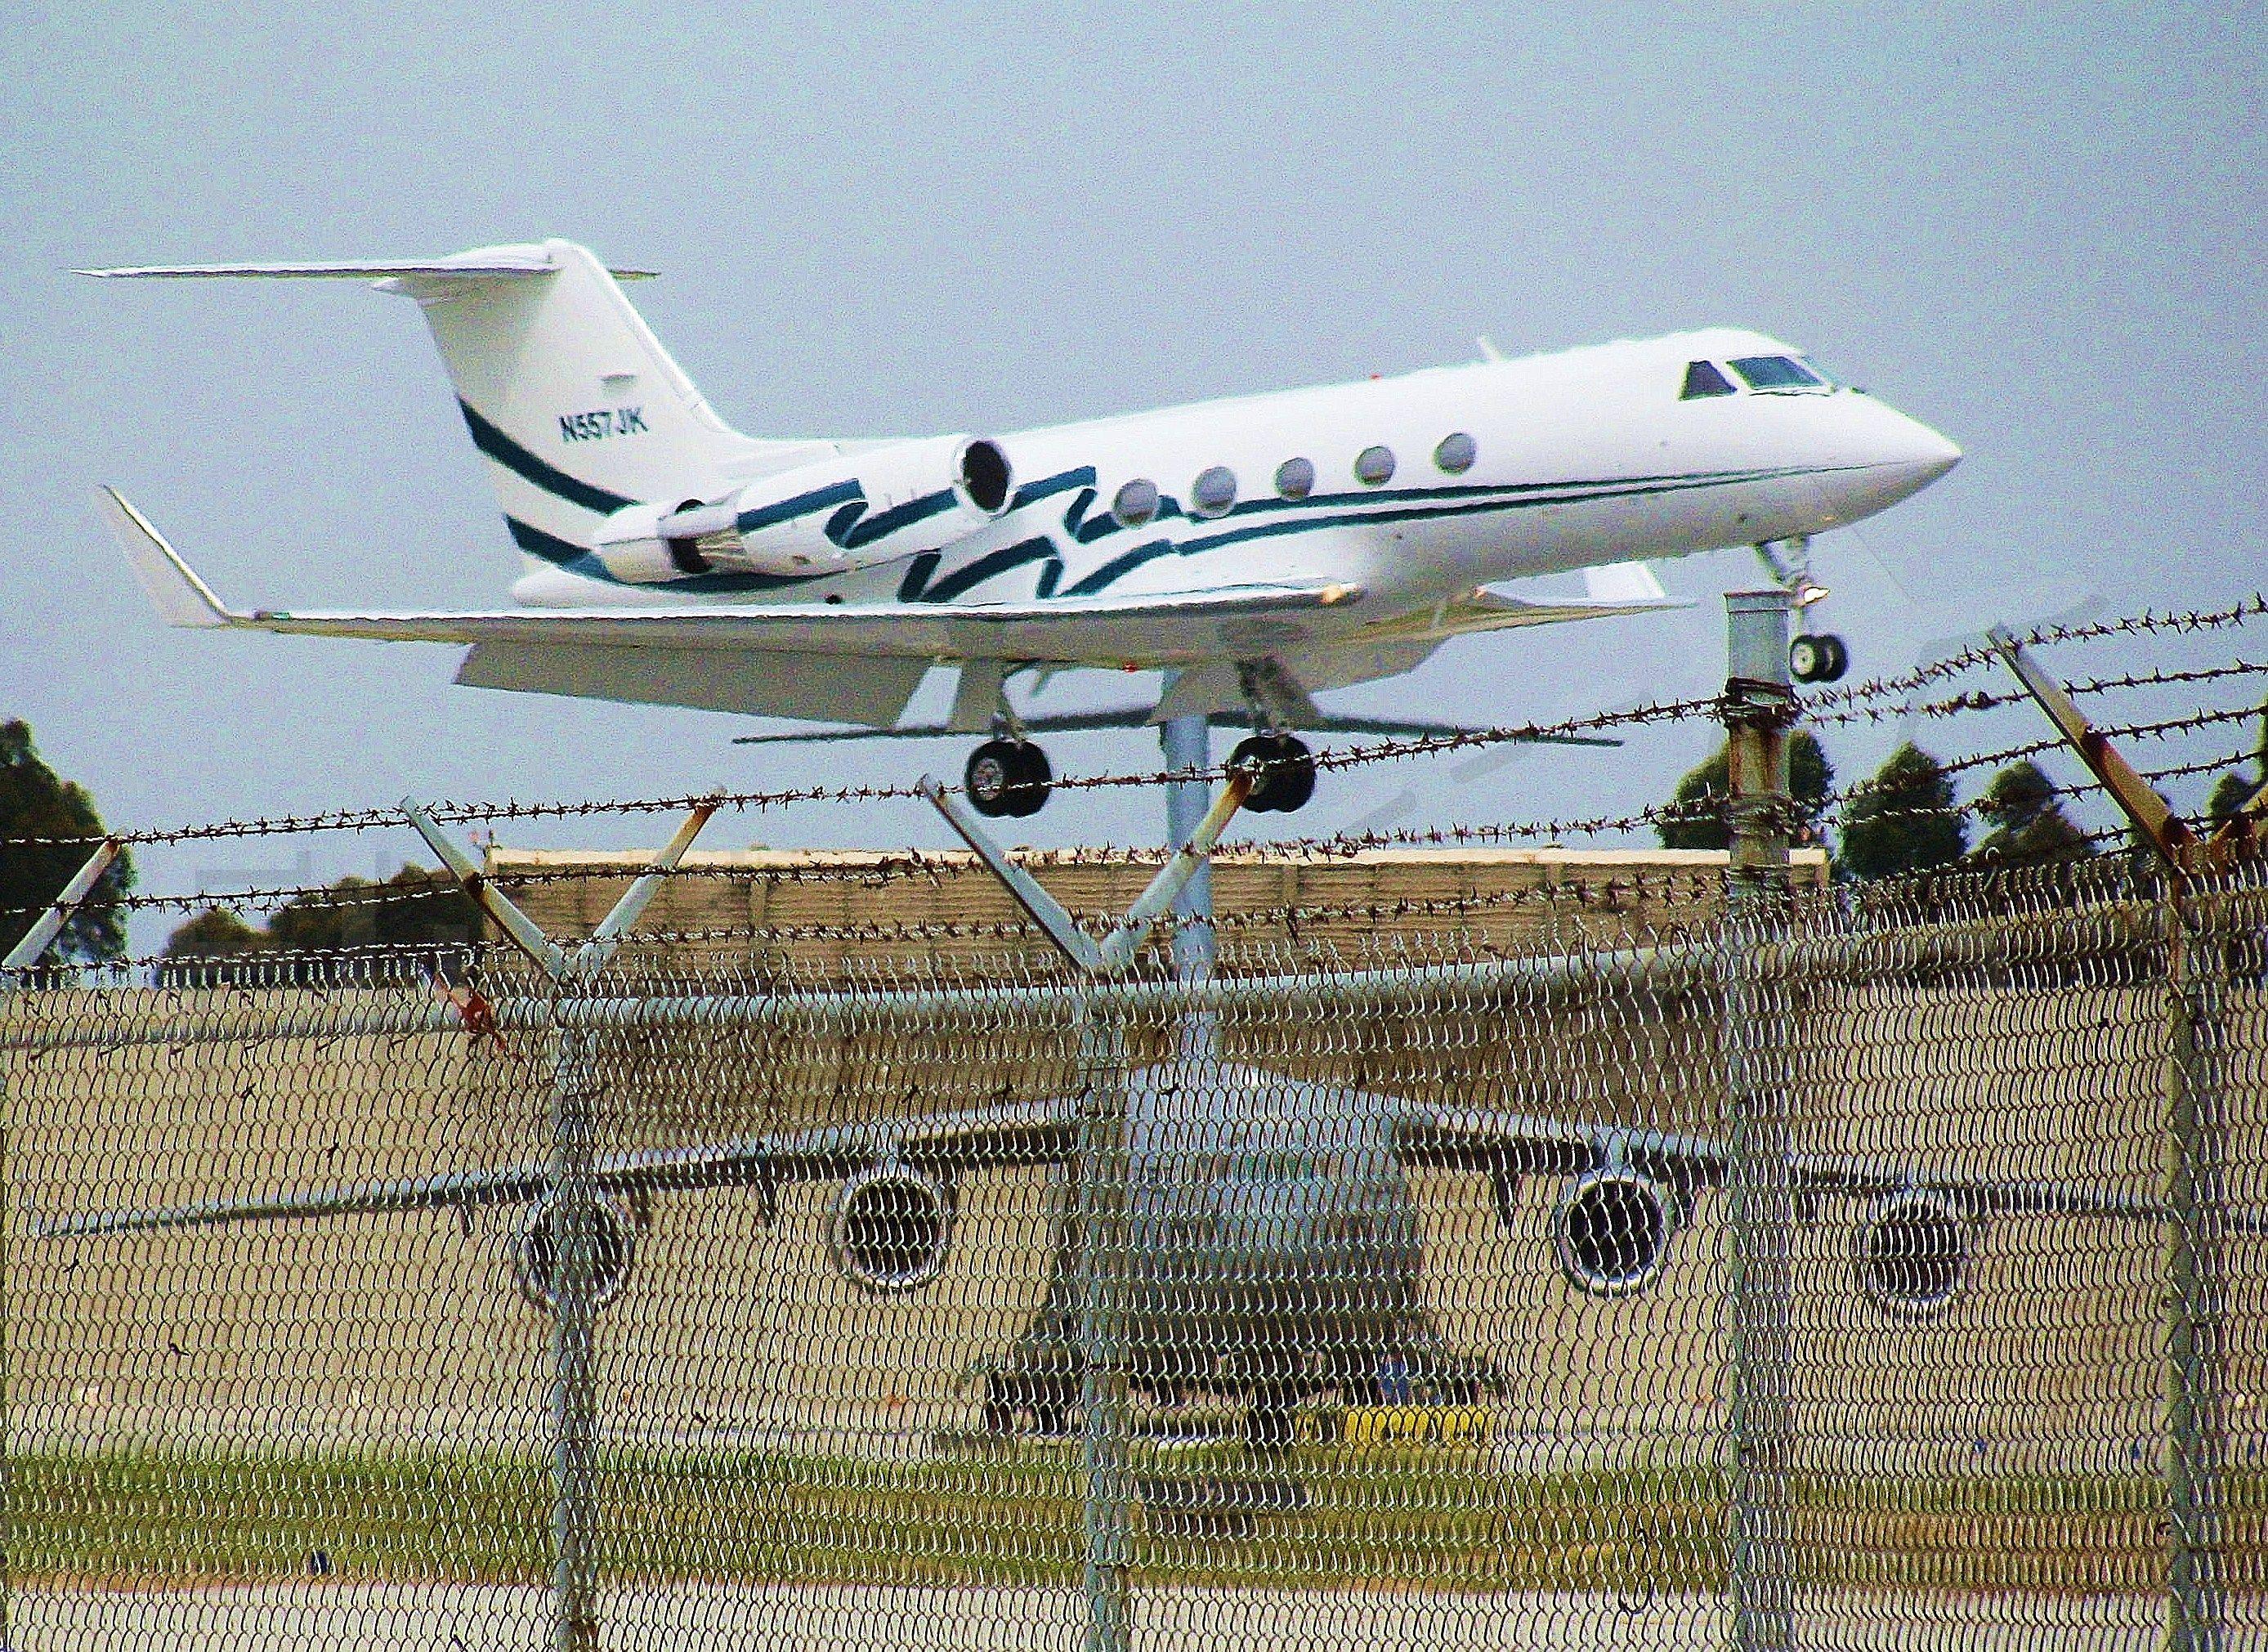 Gulfstream Aerospace Gulfstream 3 (N557JK) - Arriving after a flight from Las Vegas. The C-17 is preparing for a short test flight.